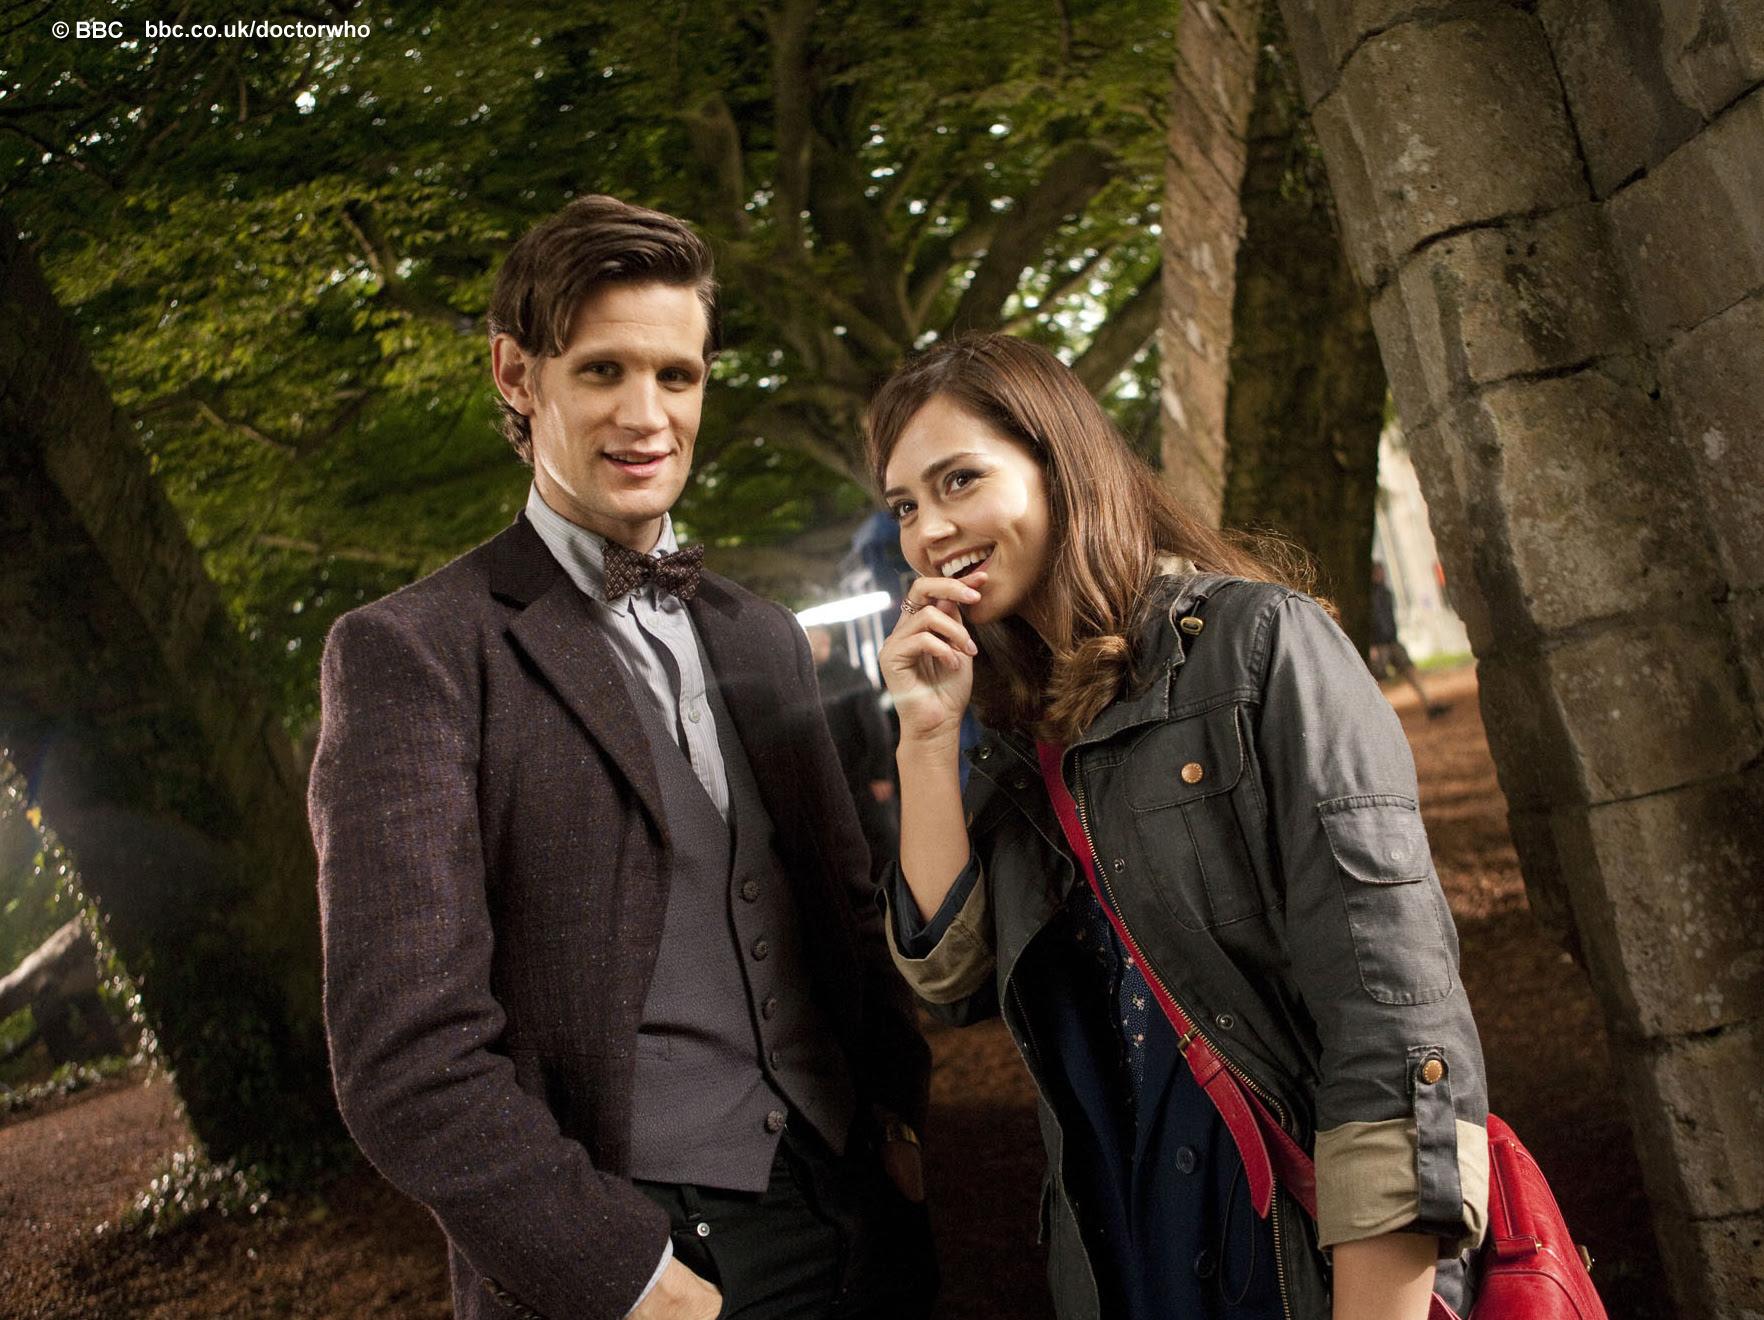 Bbc Latest News Doctor Who Matt Smith And Jenna Louise Coleman